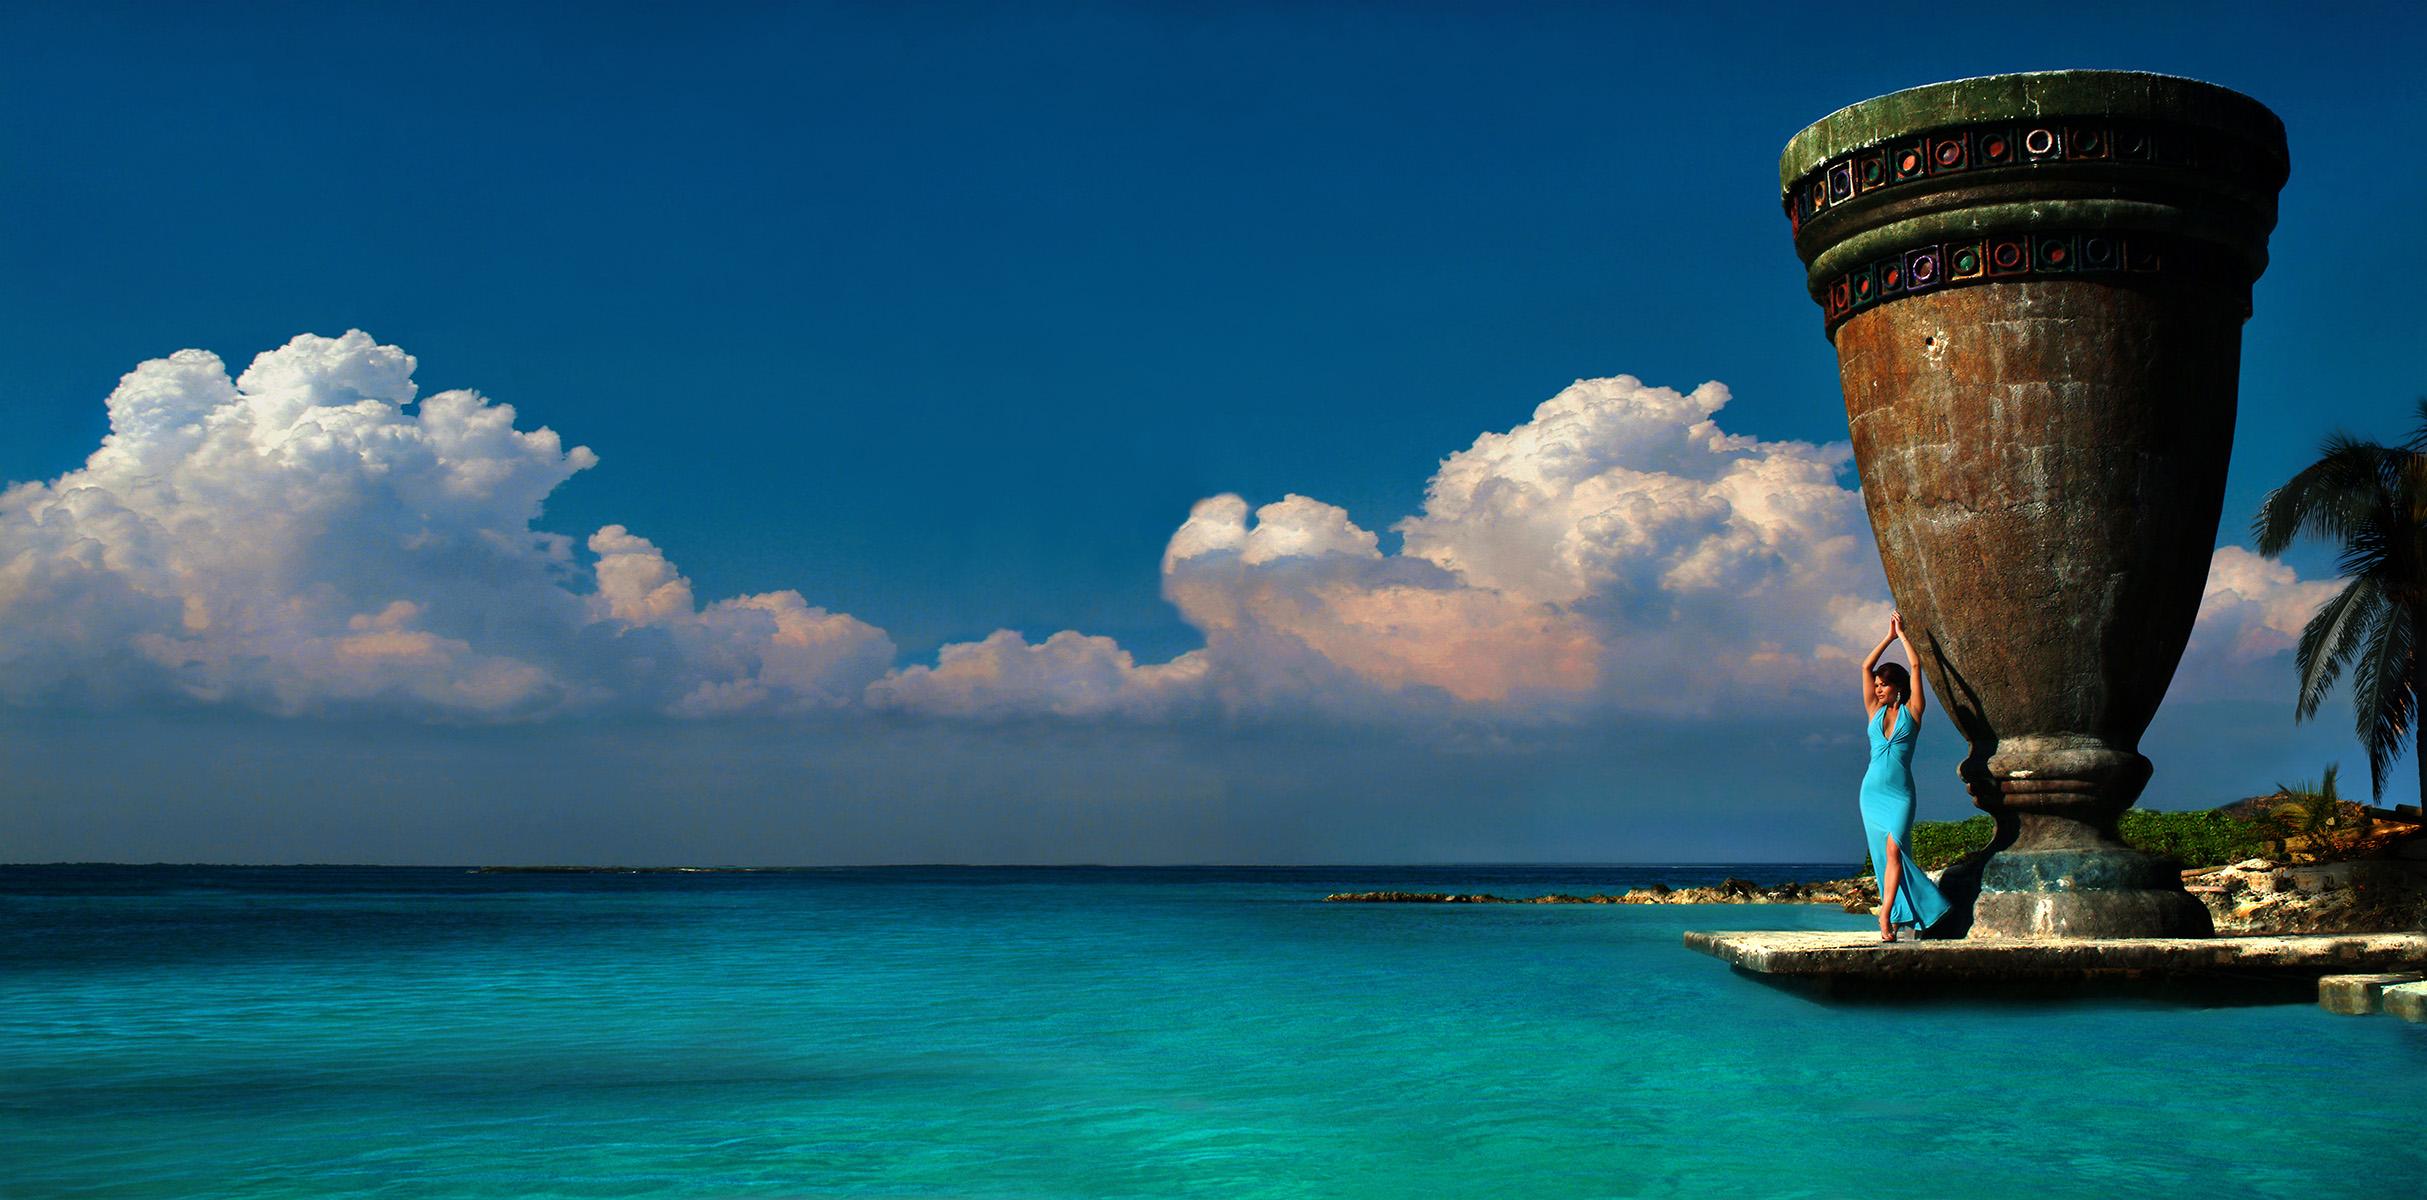 Gaia Bahamas Blue